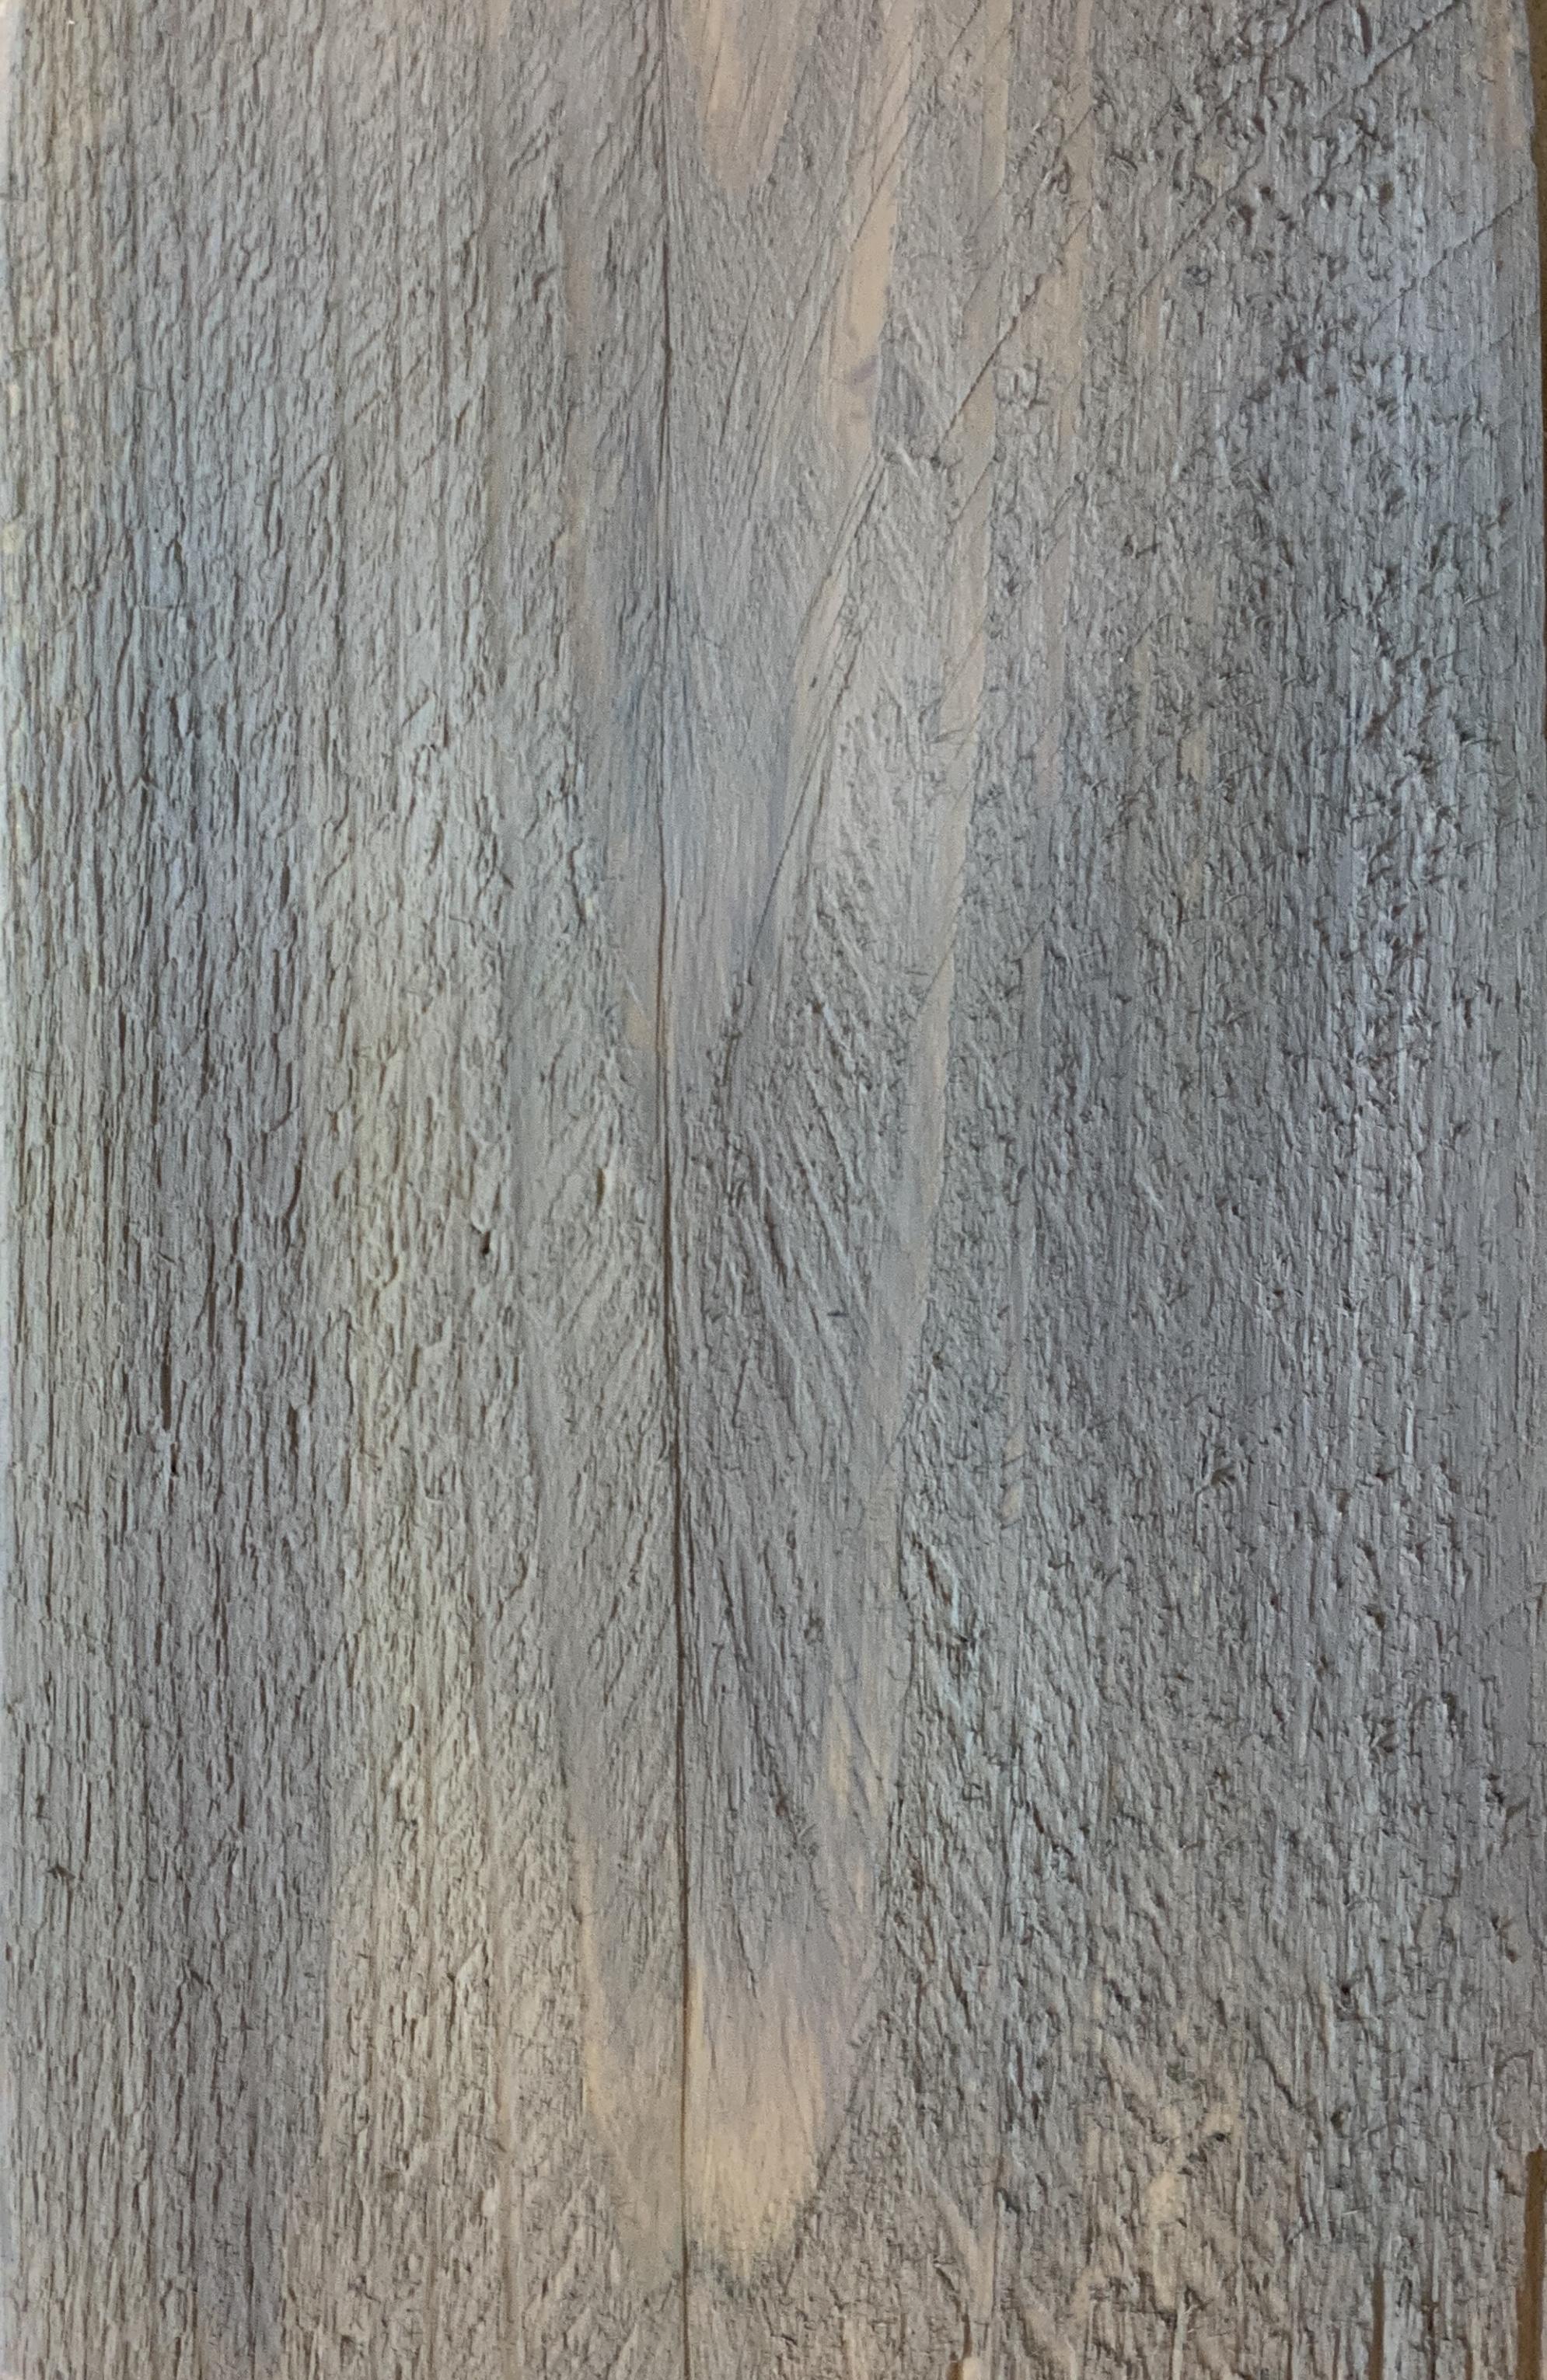 Coastal Weathered Wood